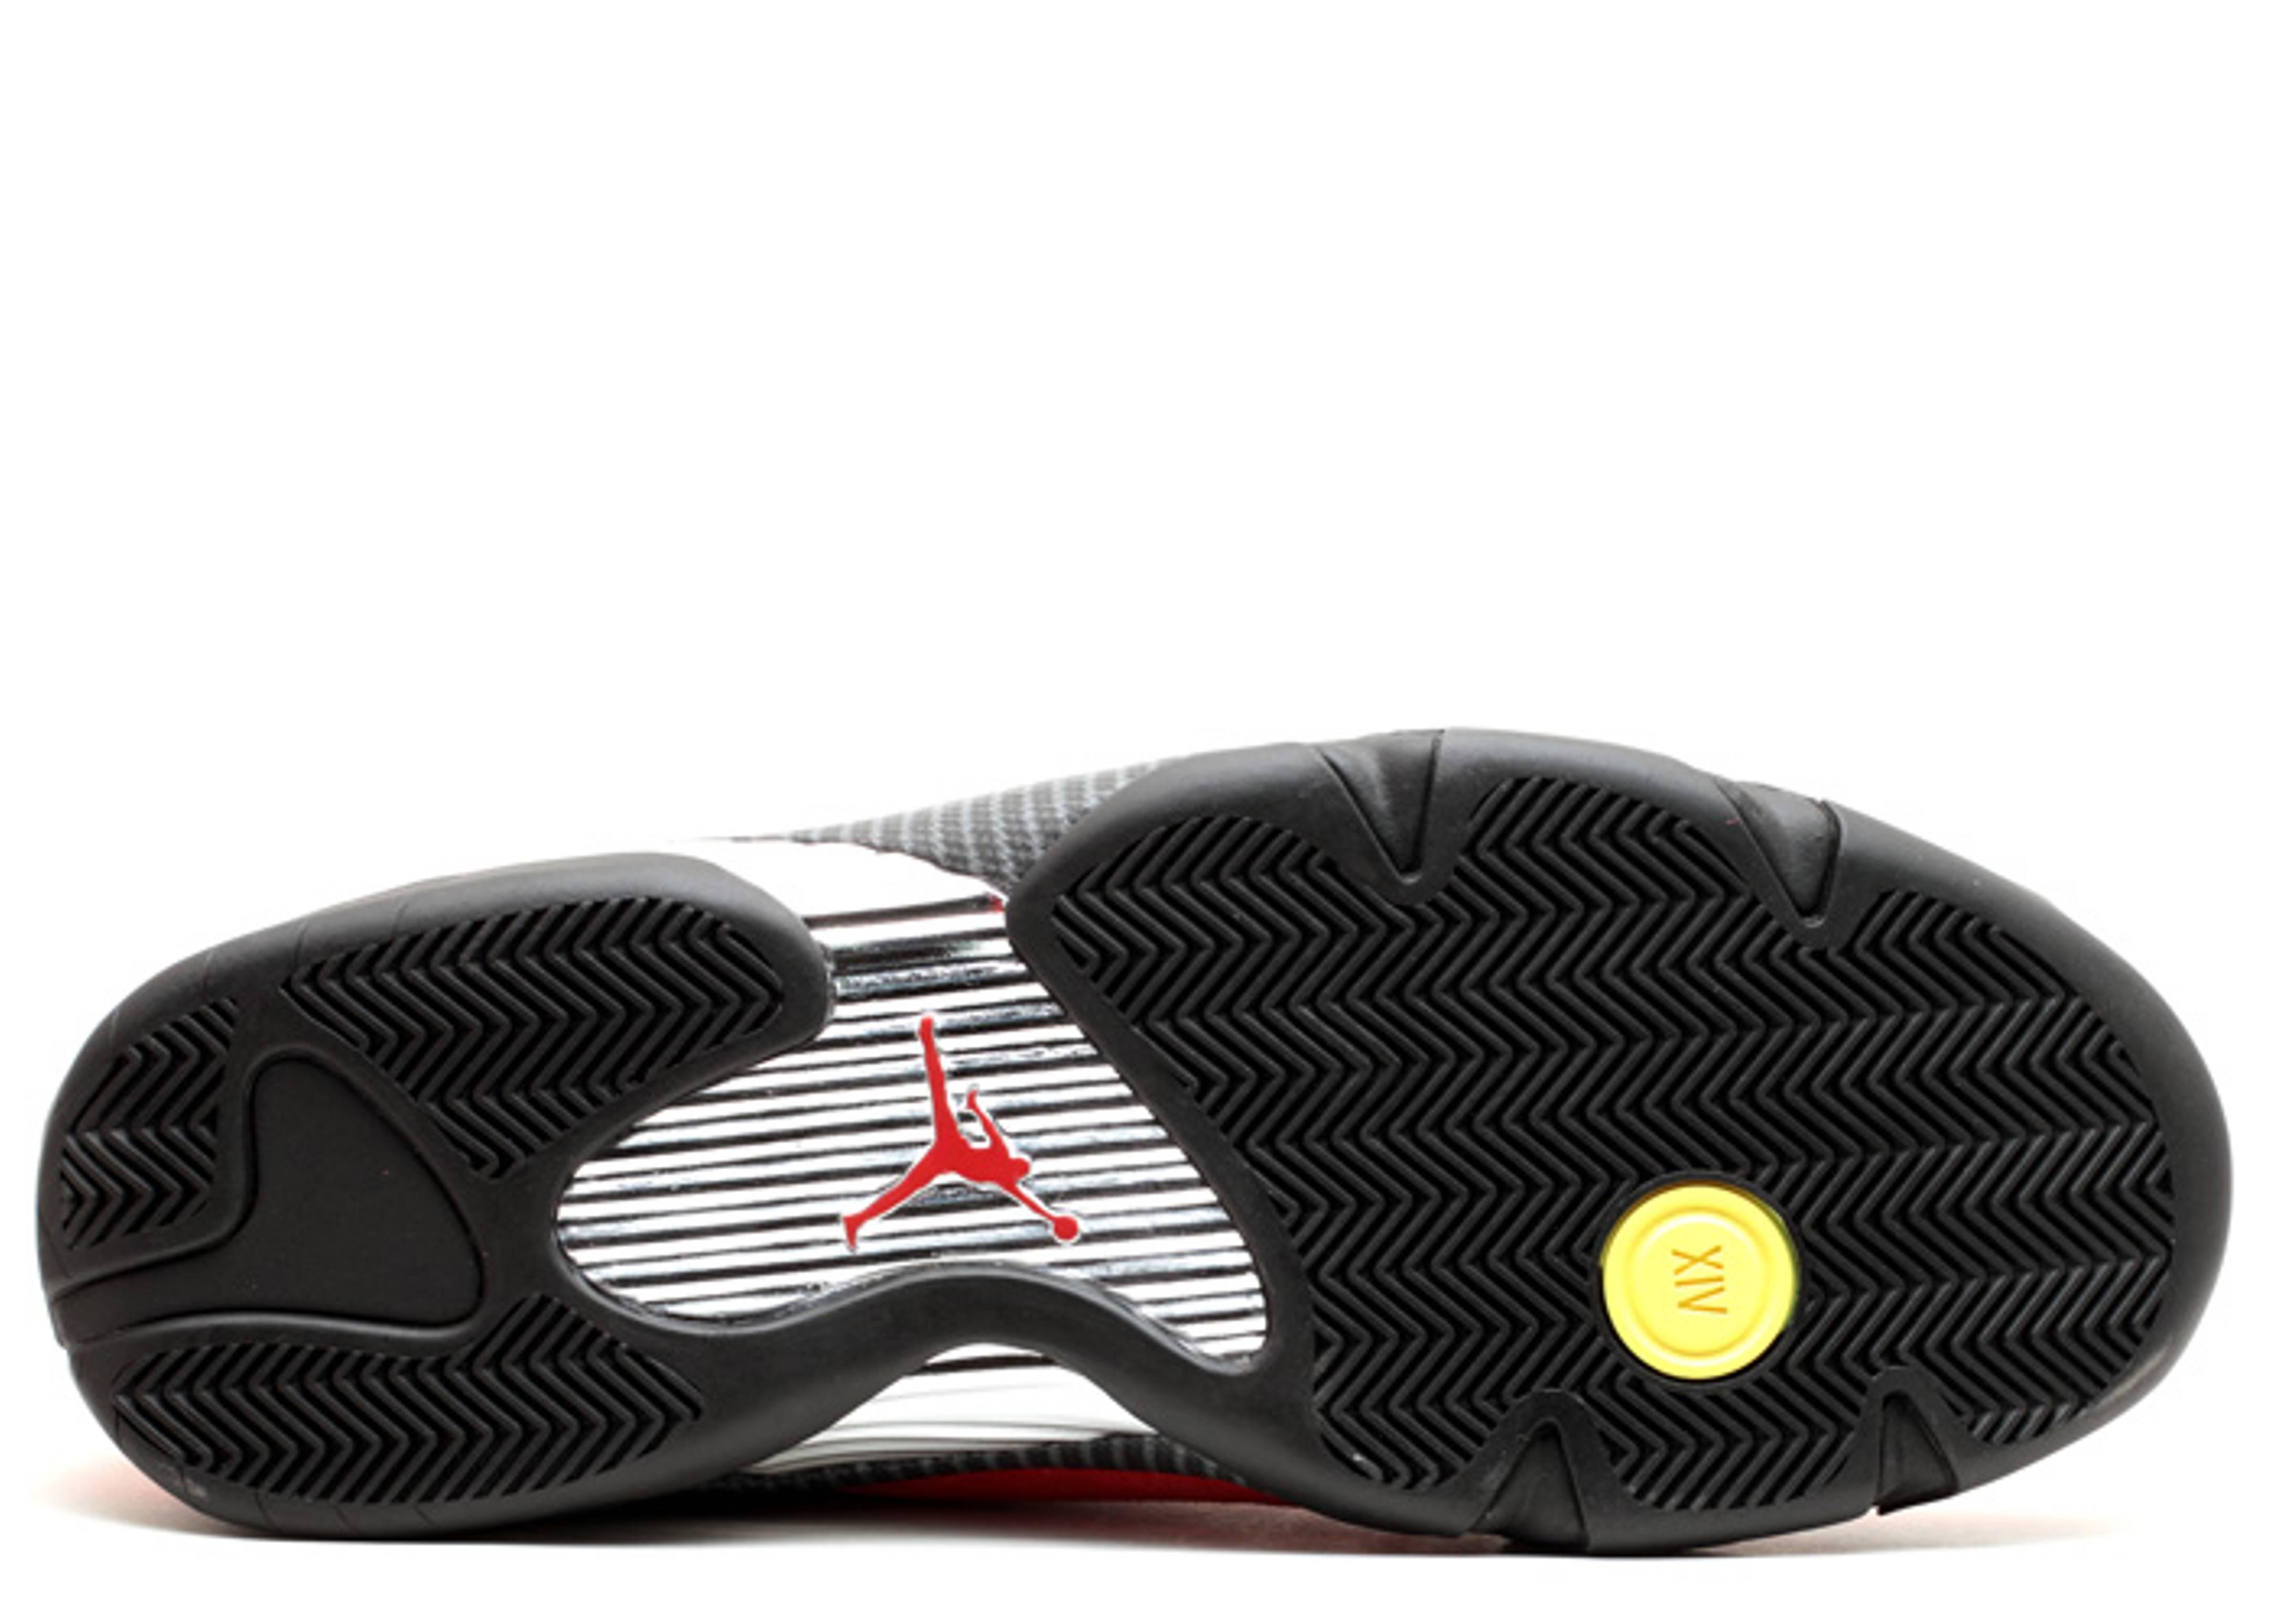 3661fdd69e5db4 Air Jordan 14 Retro